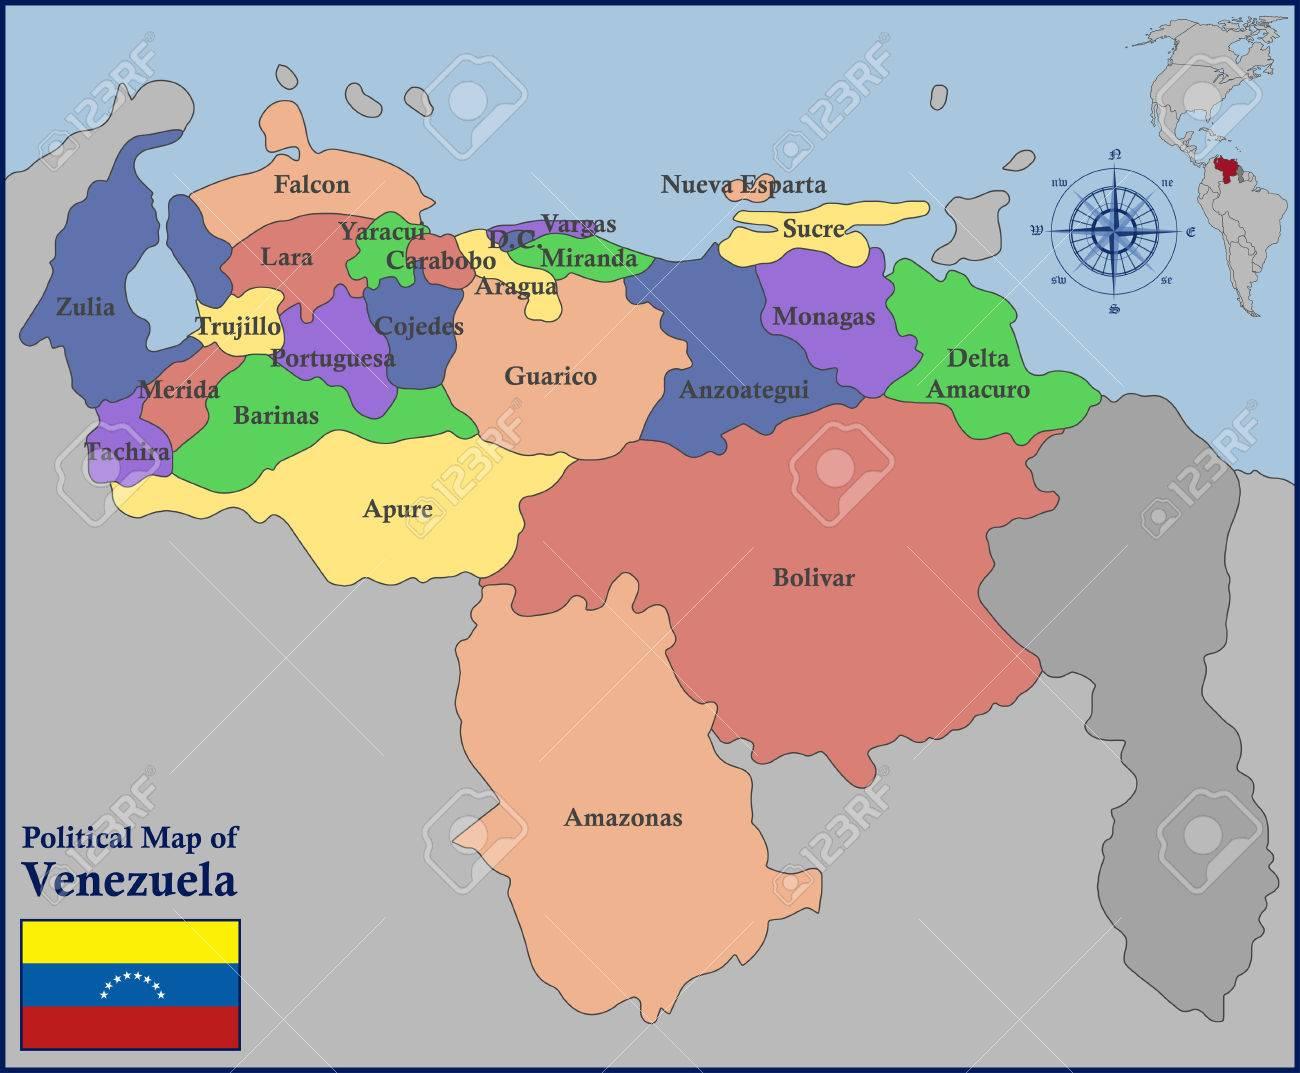 Political map of venezuela royalty free cliparts vectors and stock political map of venezuela stock vector 57221322 gumiabroncs Choice Image